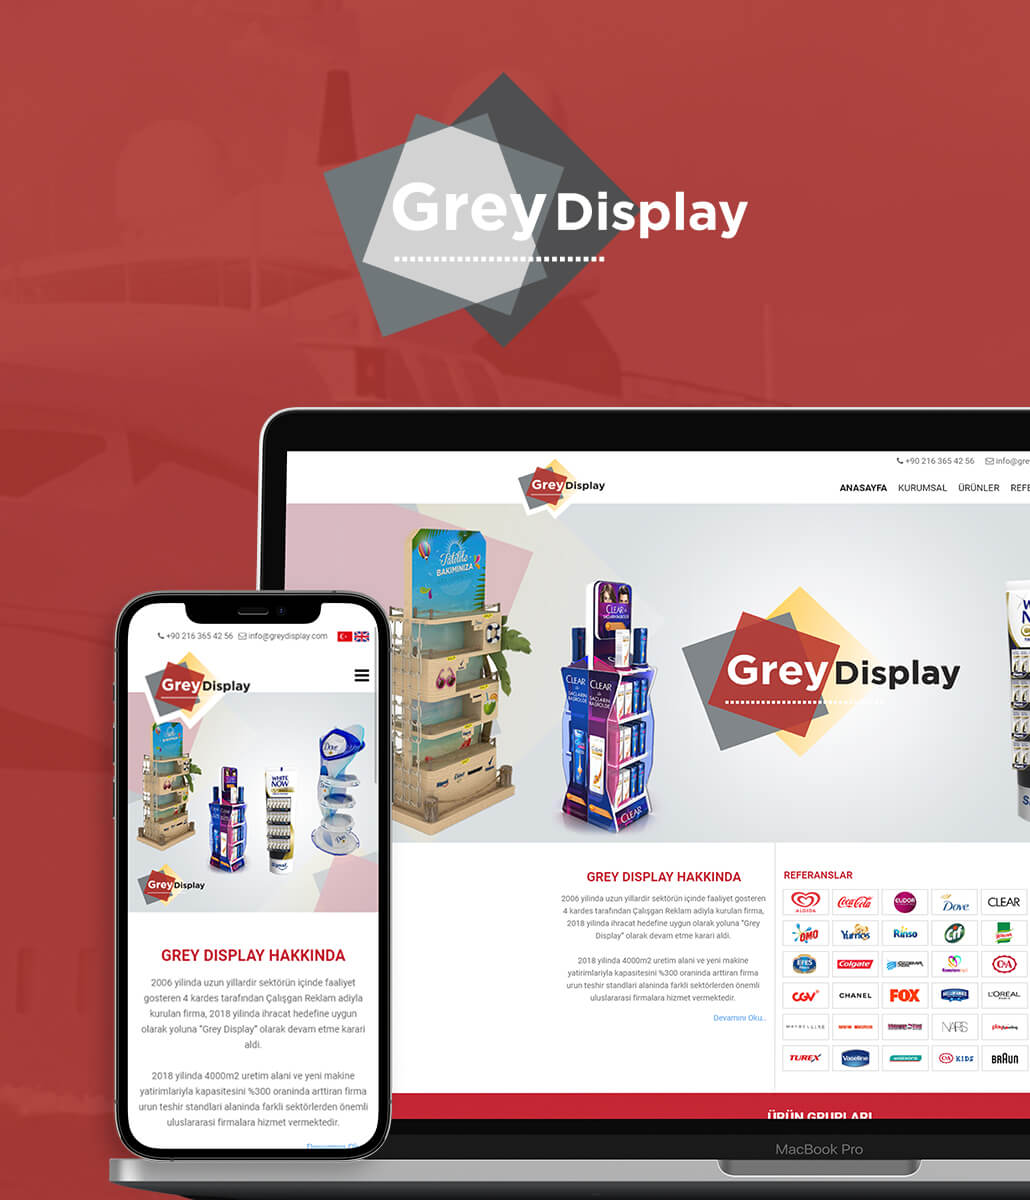 Grey Display Kurumsal Web Sitesi